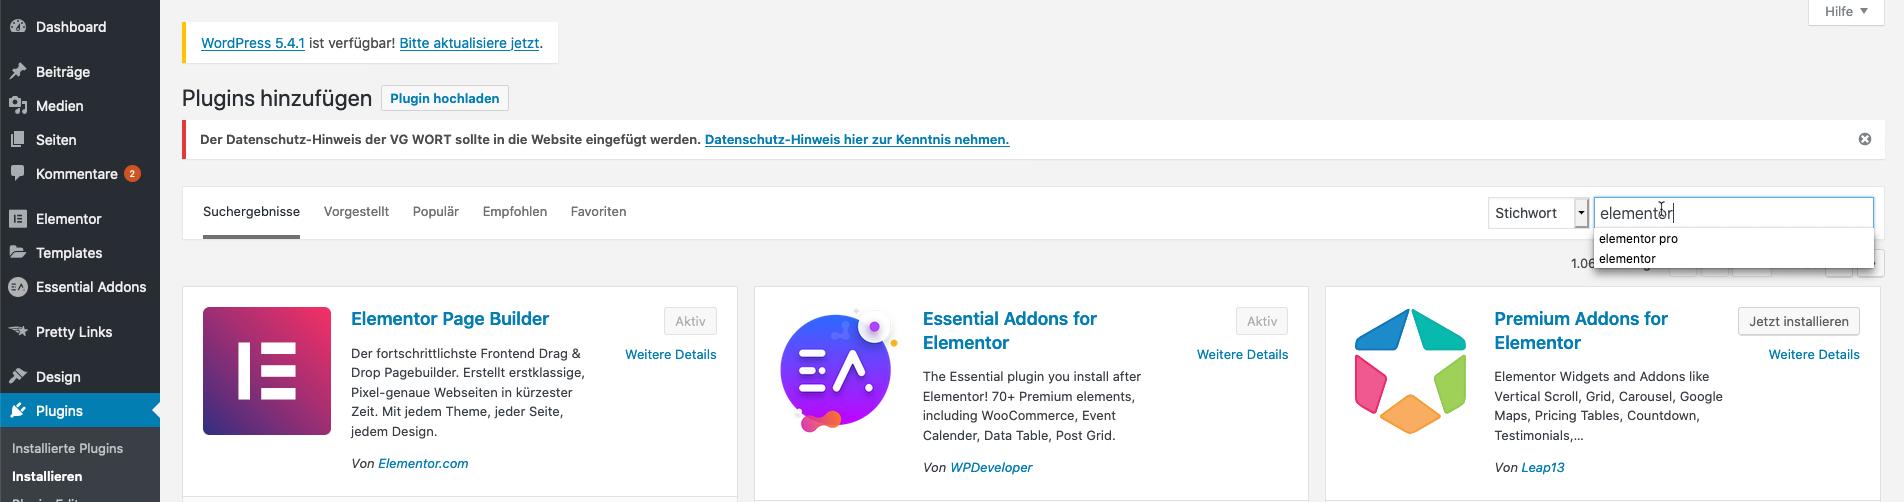 Download Elementor Page Builder, WordPress Page Builer Anleitung